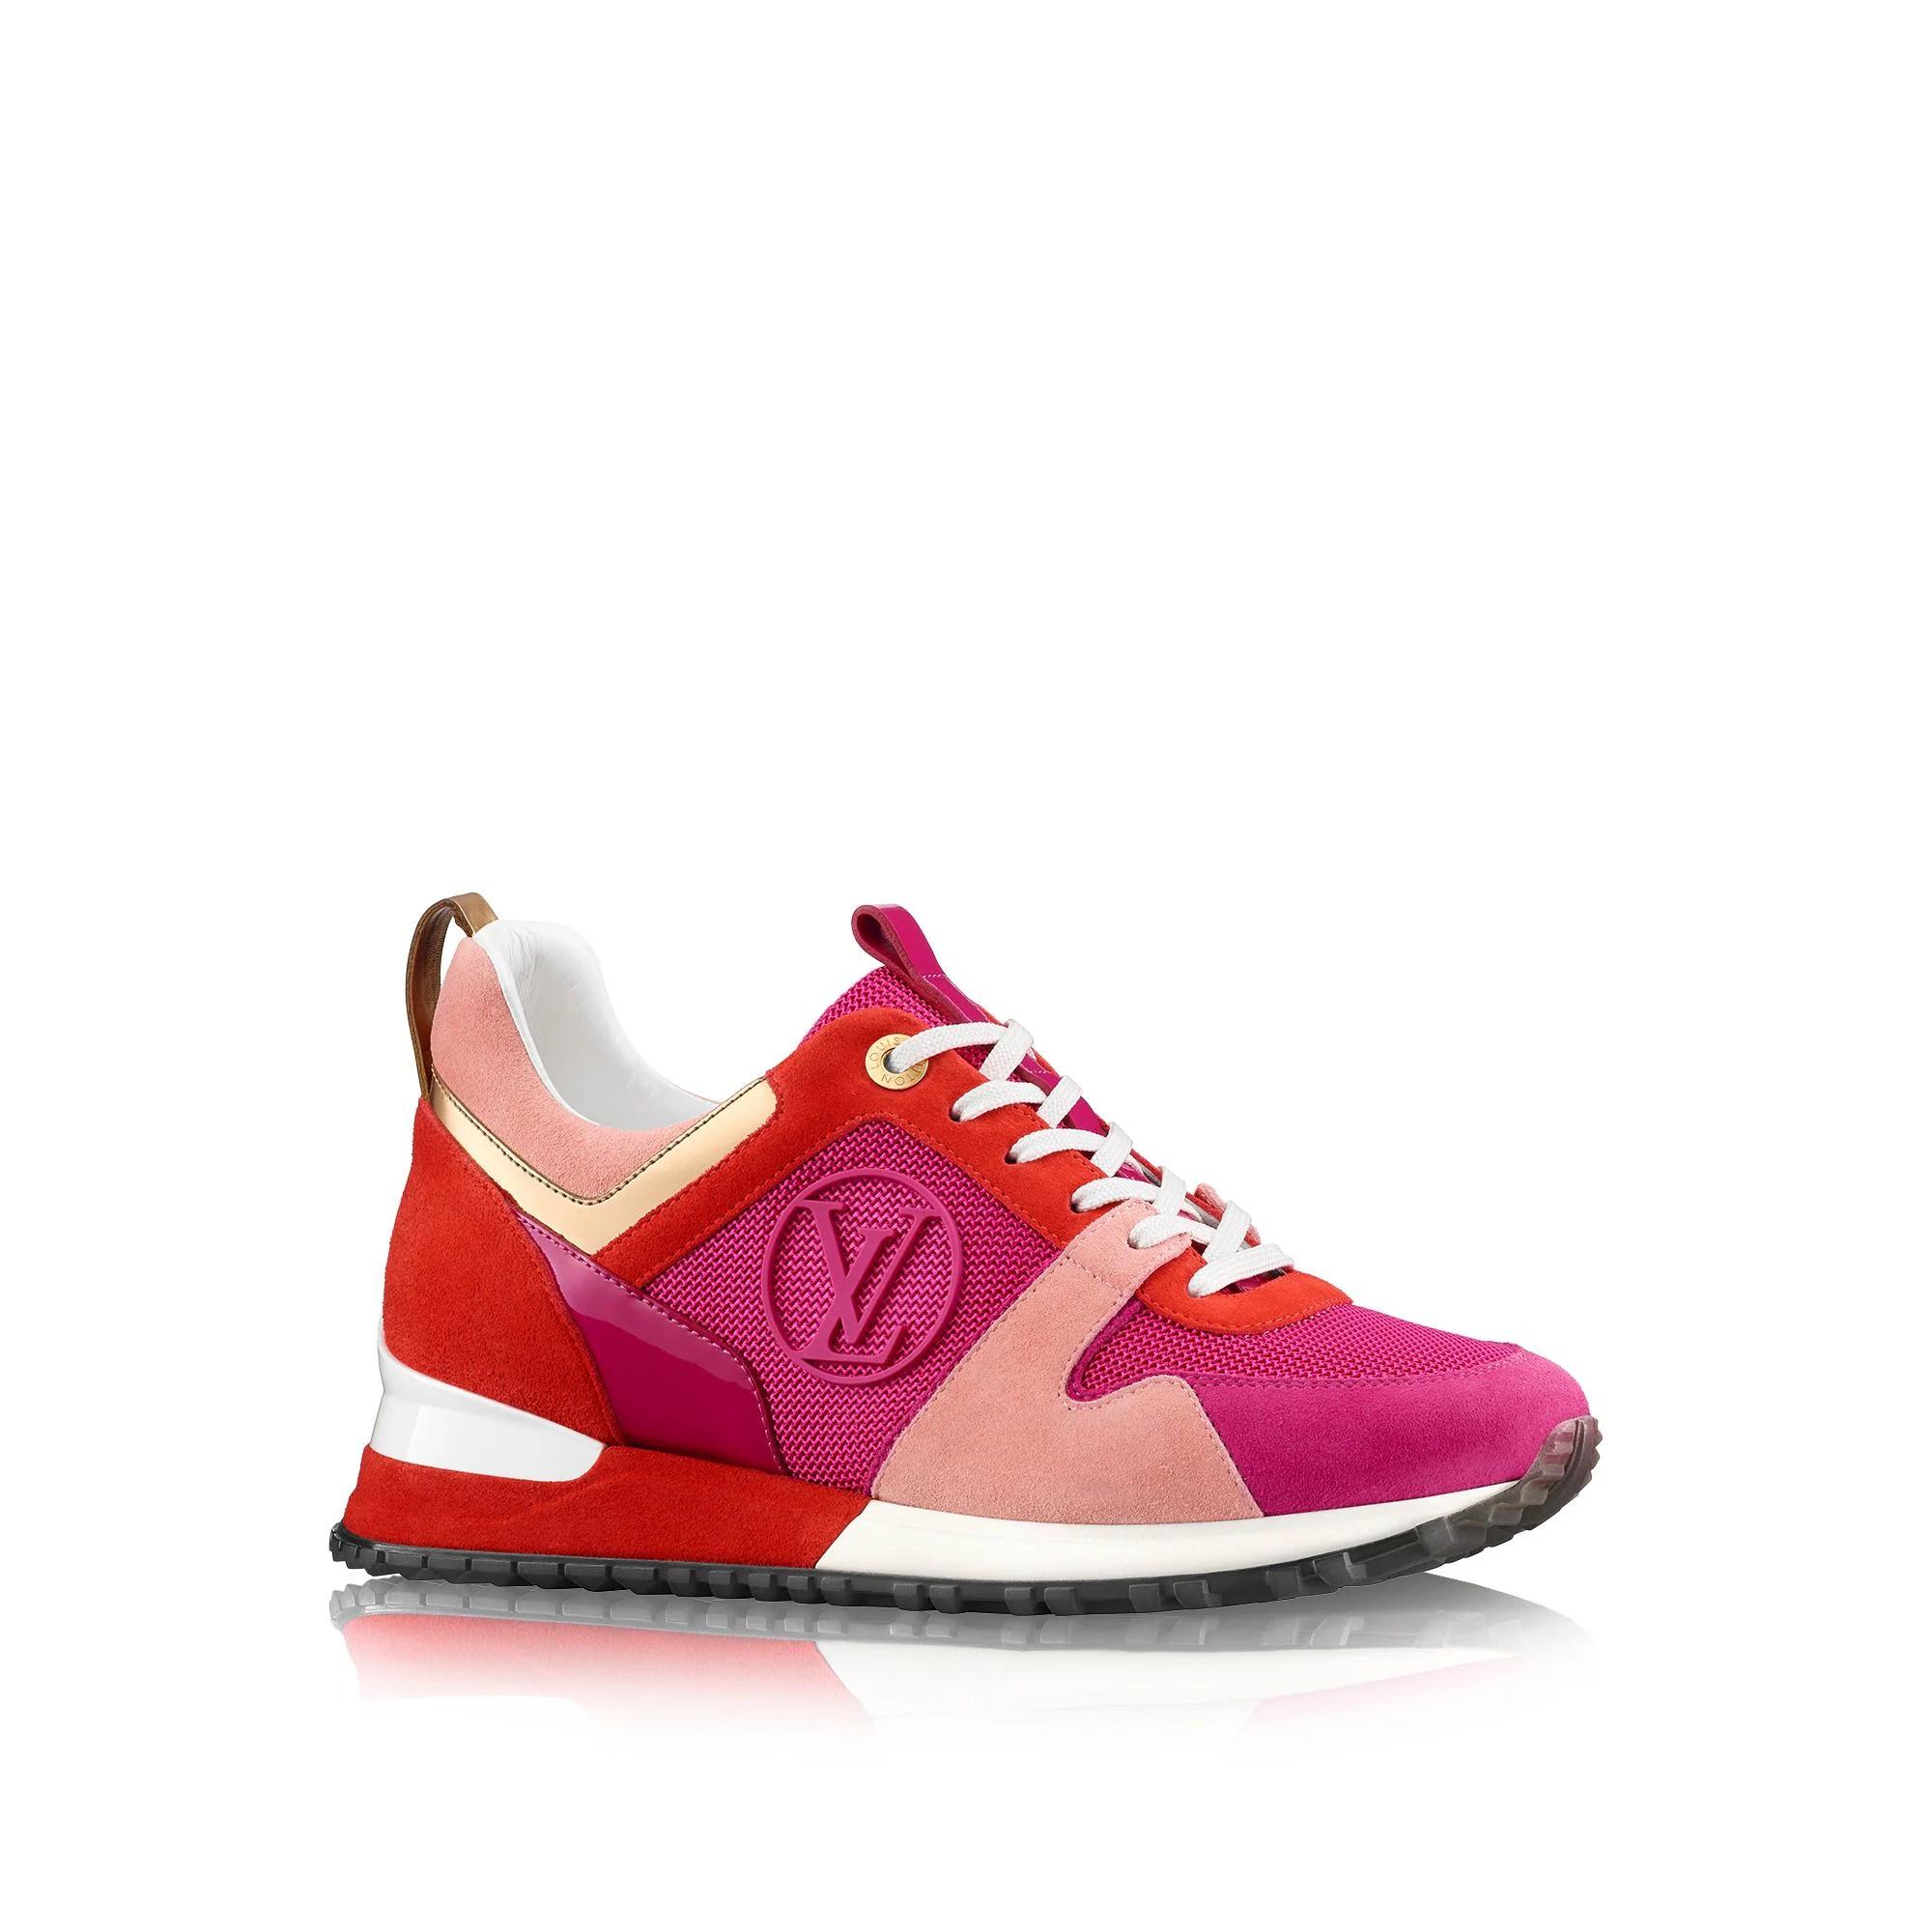 Dansko Shoes Spring 2017